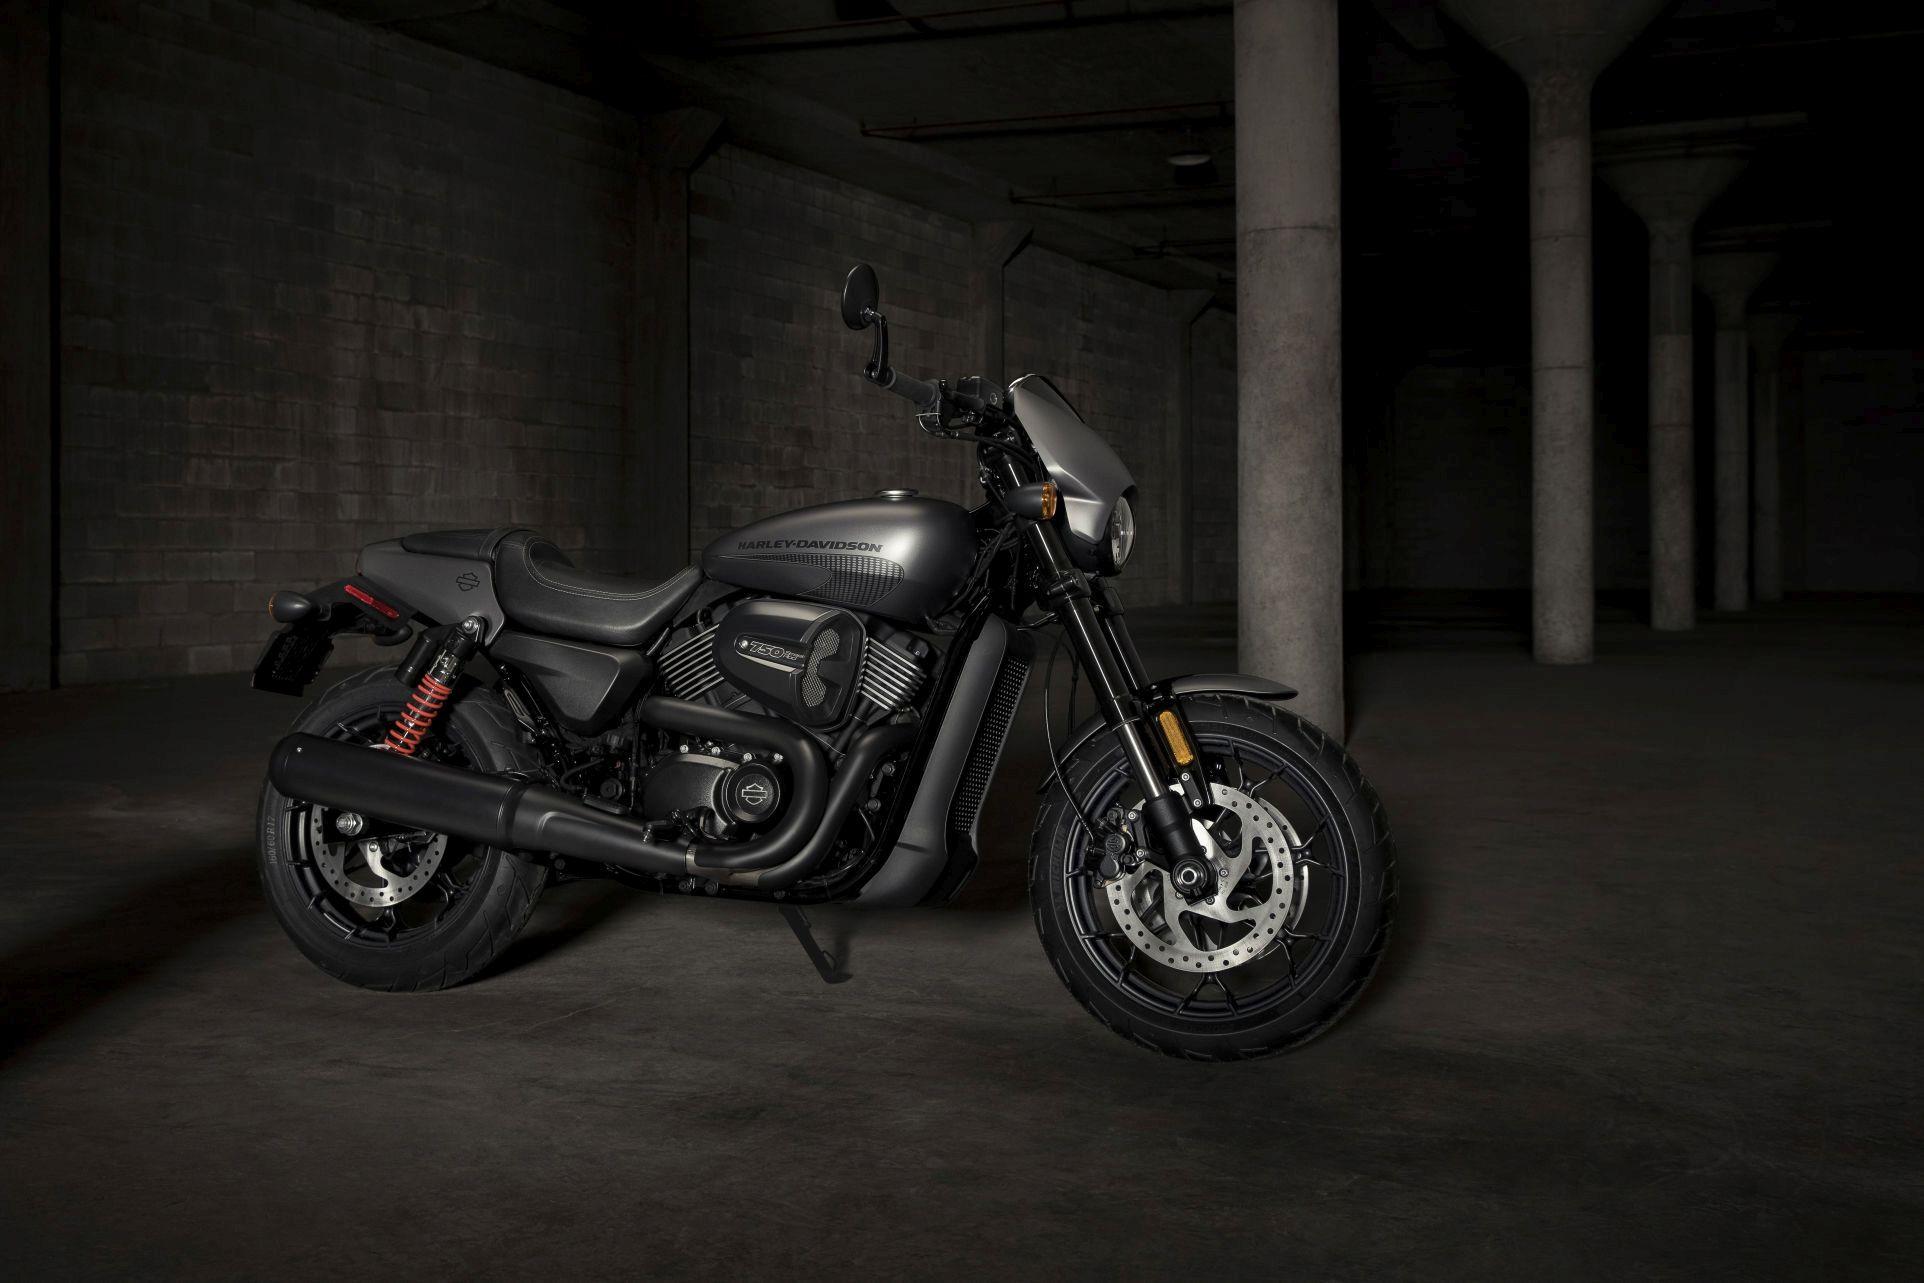 Motorok Harley-Davidson Street Rod (2017)